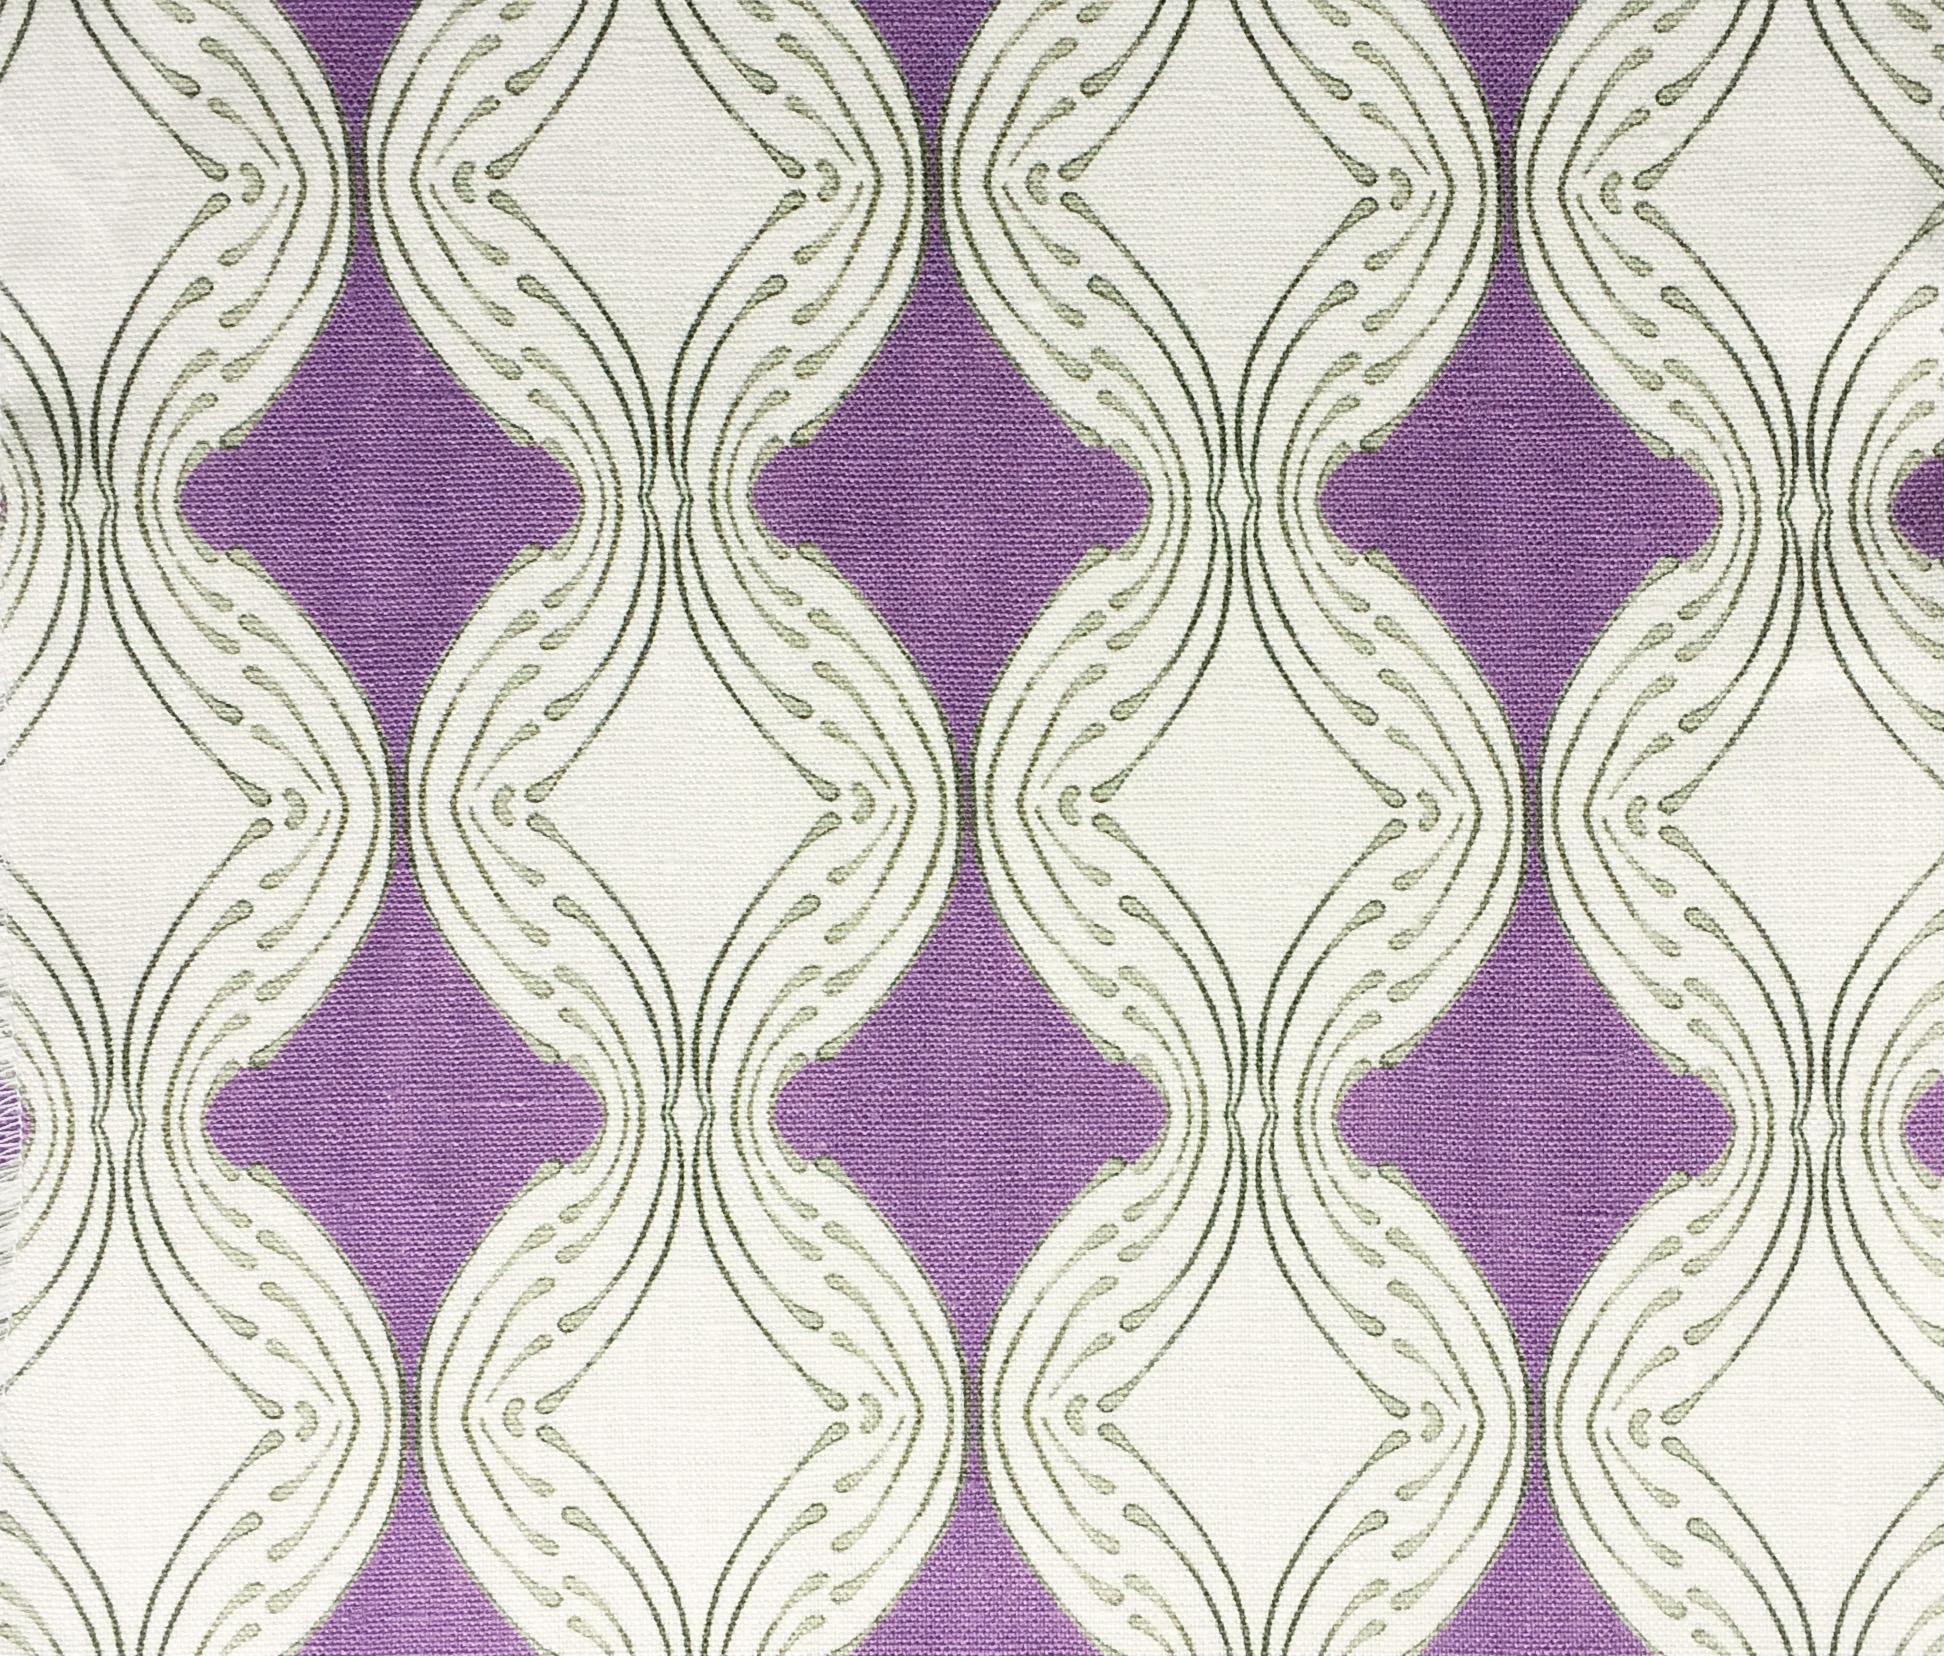 Hourglass: Lilac